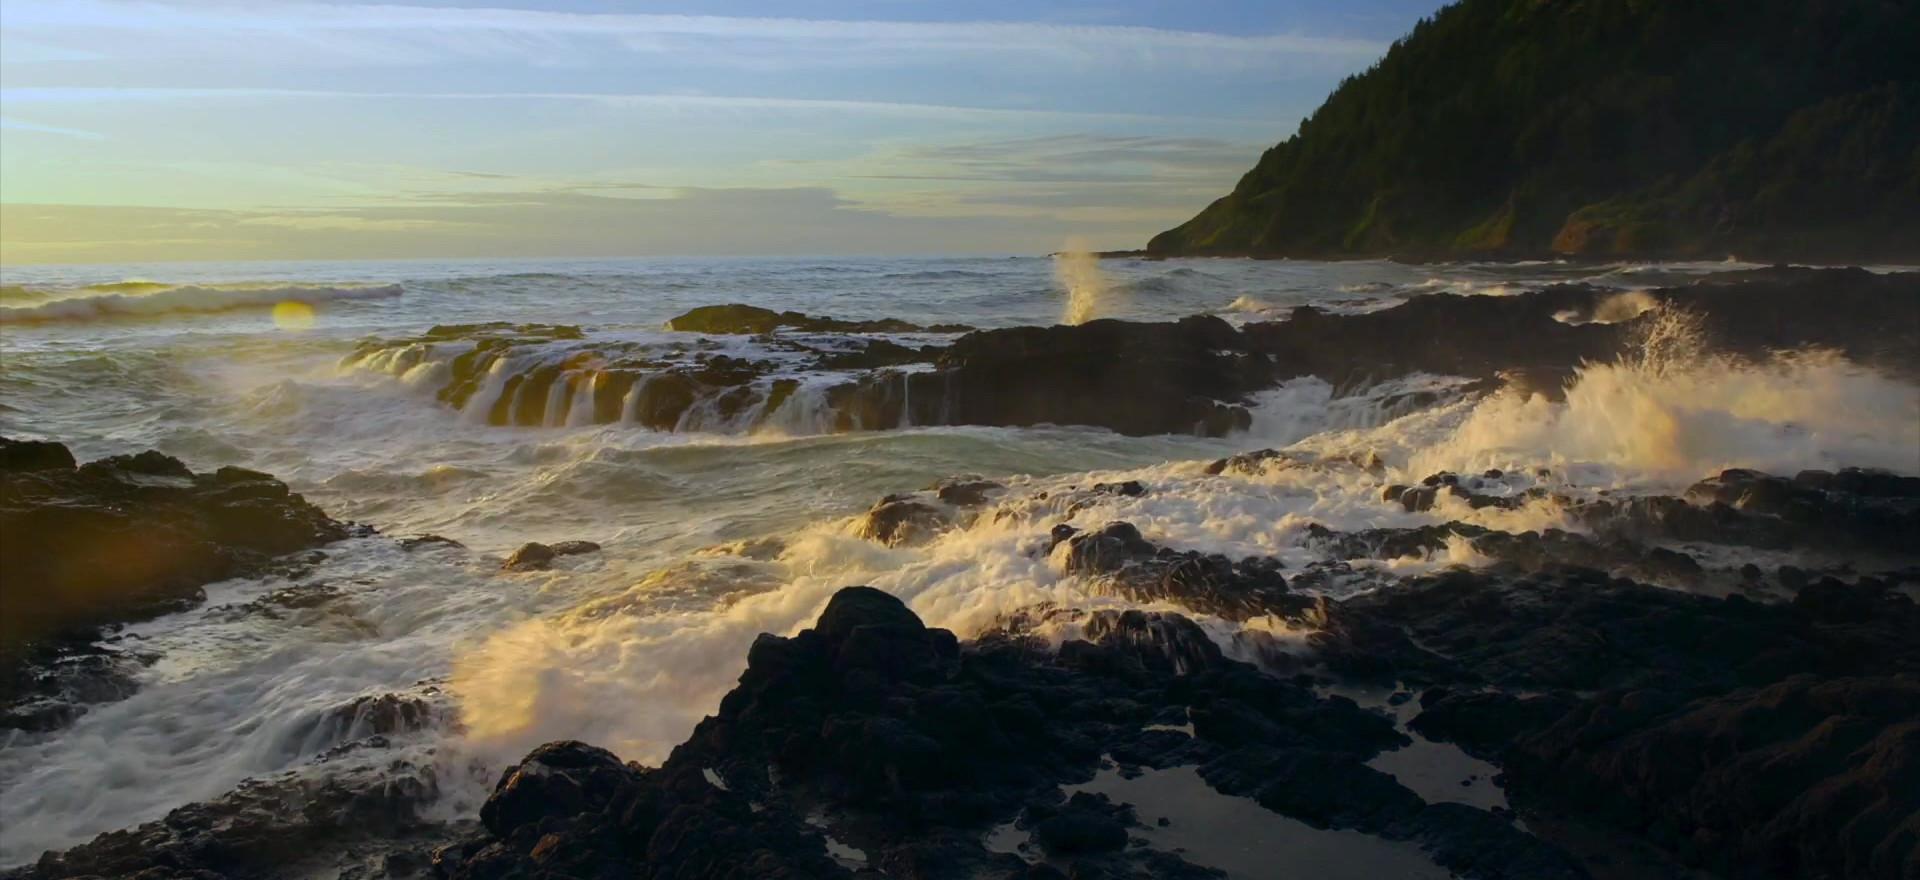 Perpetual Waves Backlit, Cape Perpetua, Oregon